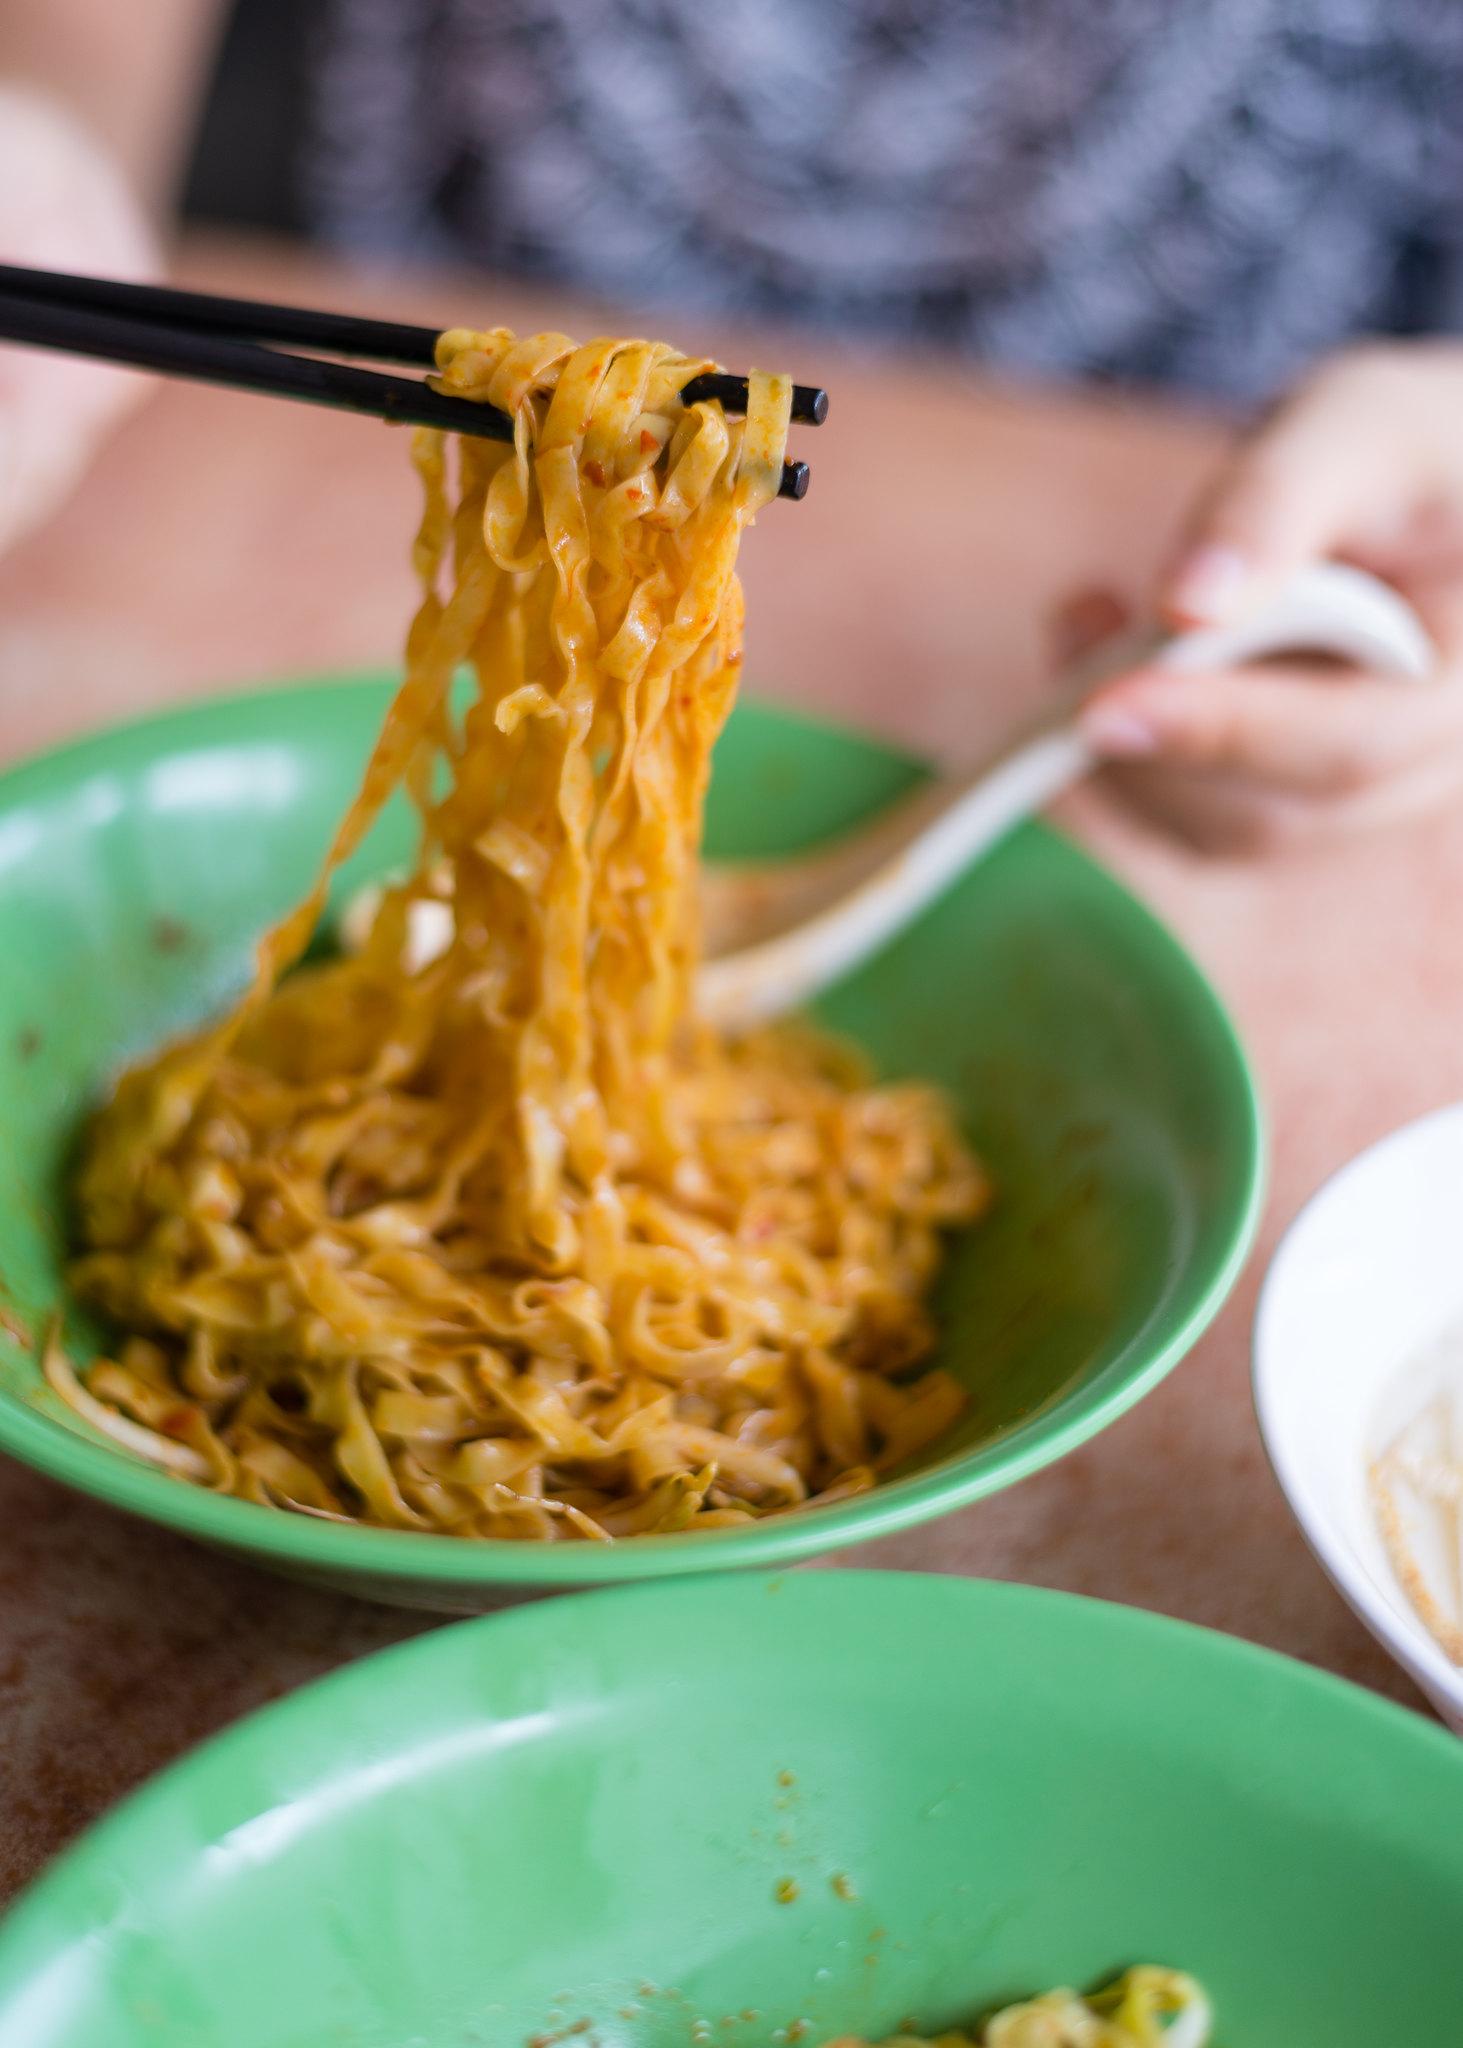 Ah Hua Teochew Fishball Noodles DSC_7852-1